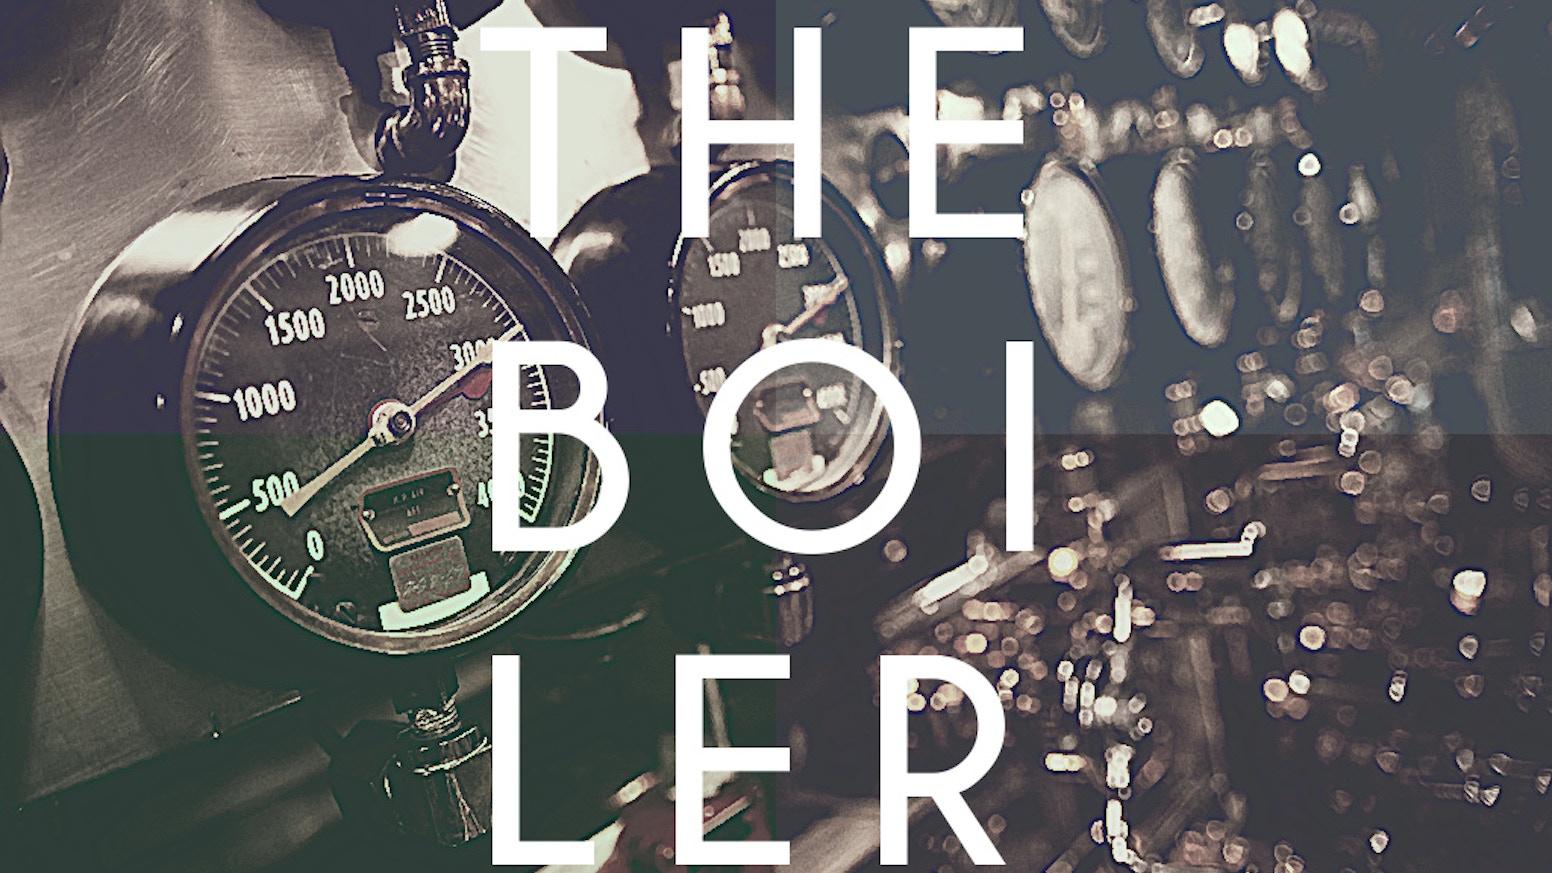 The Boiler Journal Biennial by Sebastian H Paramo » Last